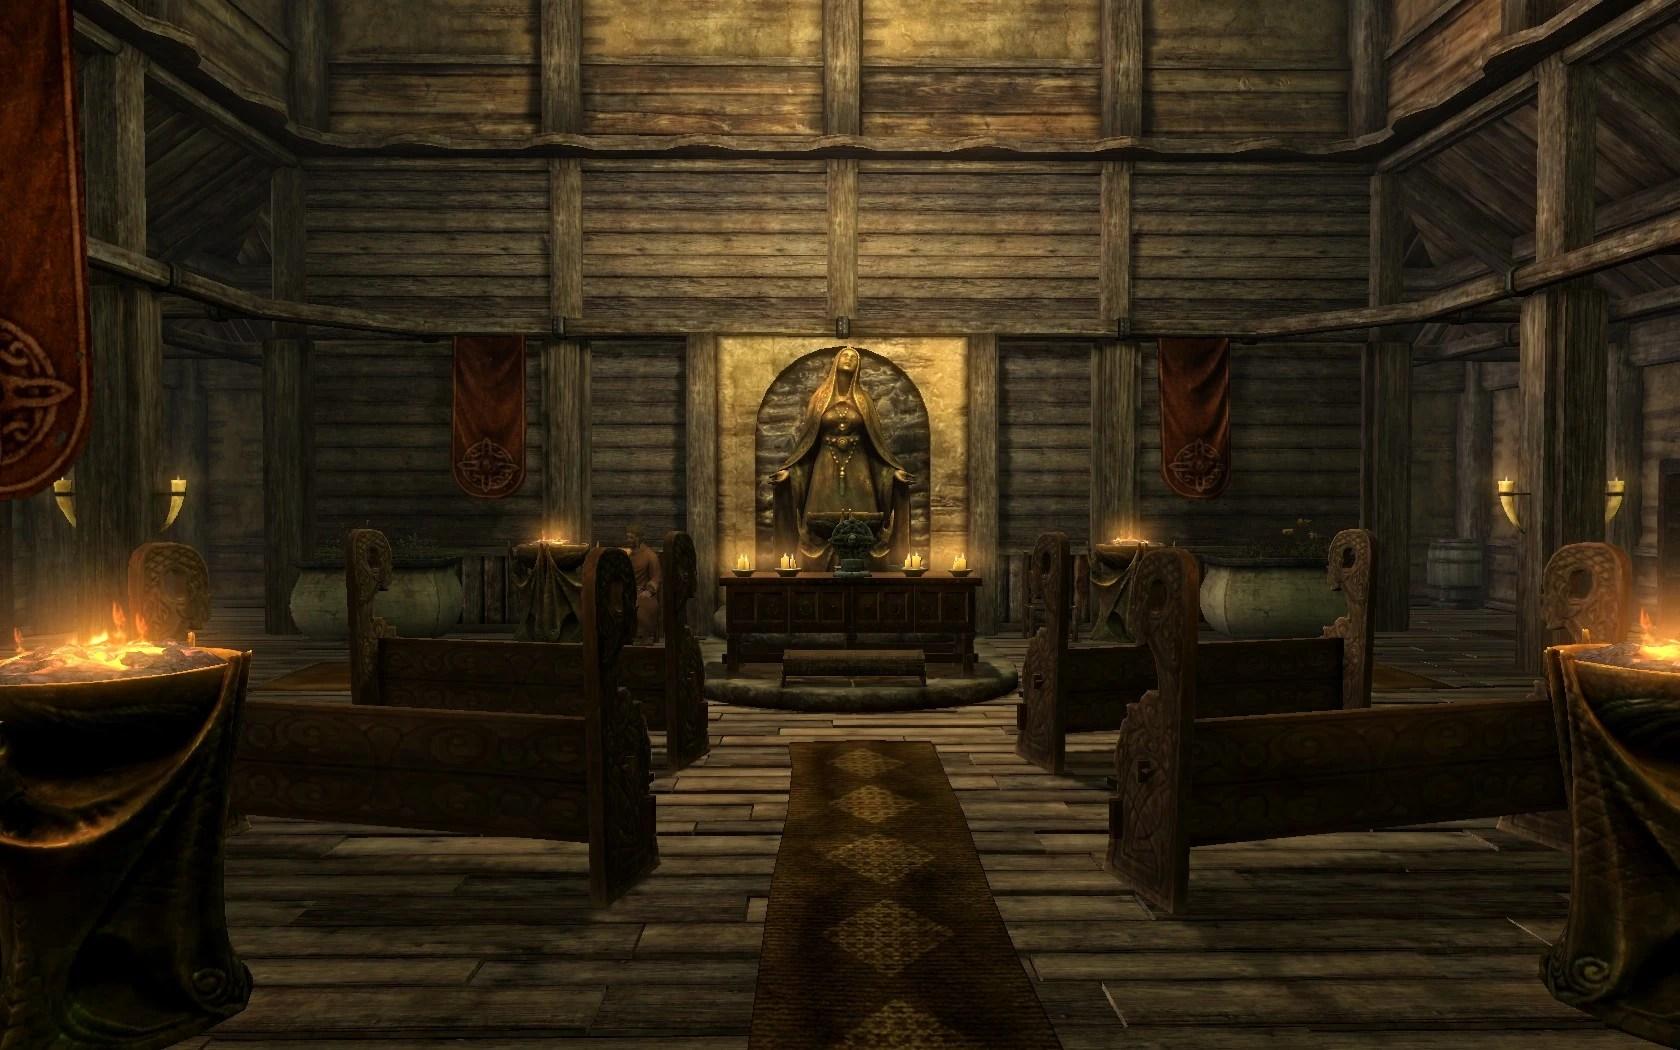 temple of mara skyrim